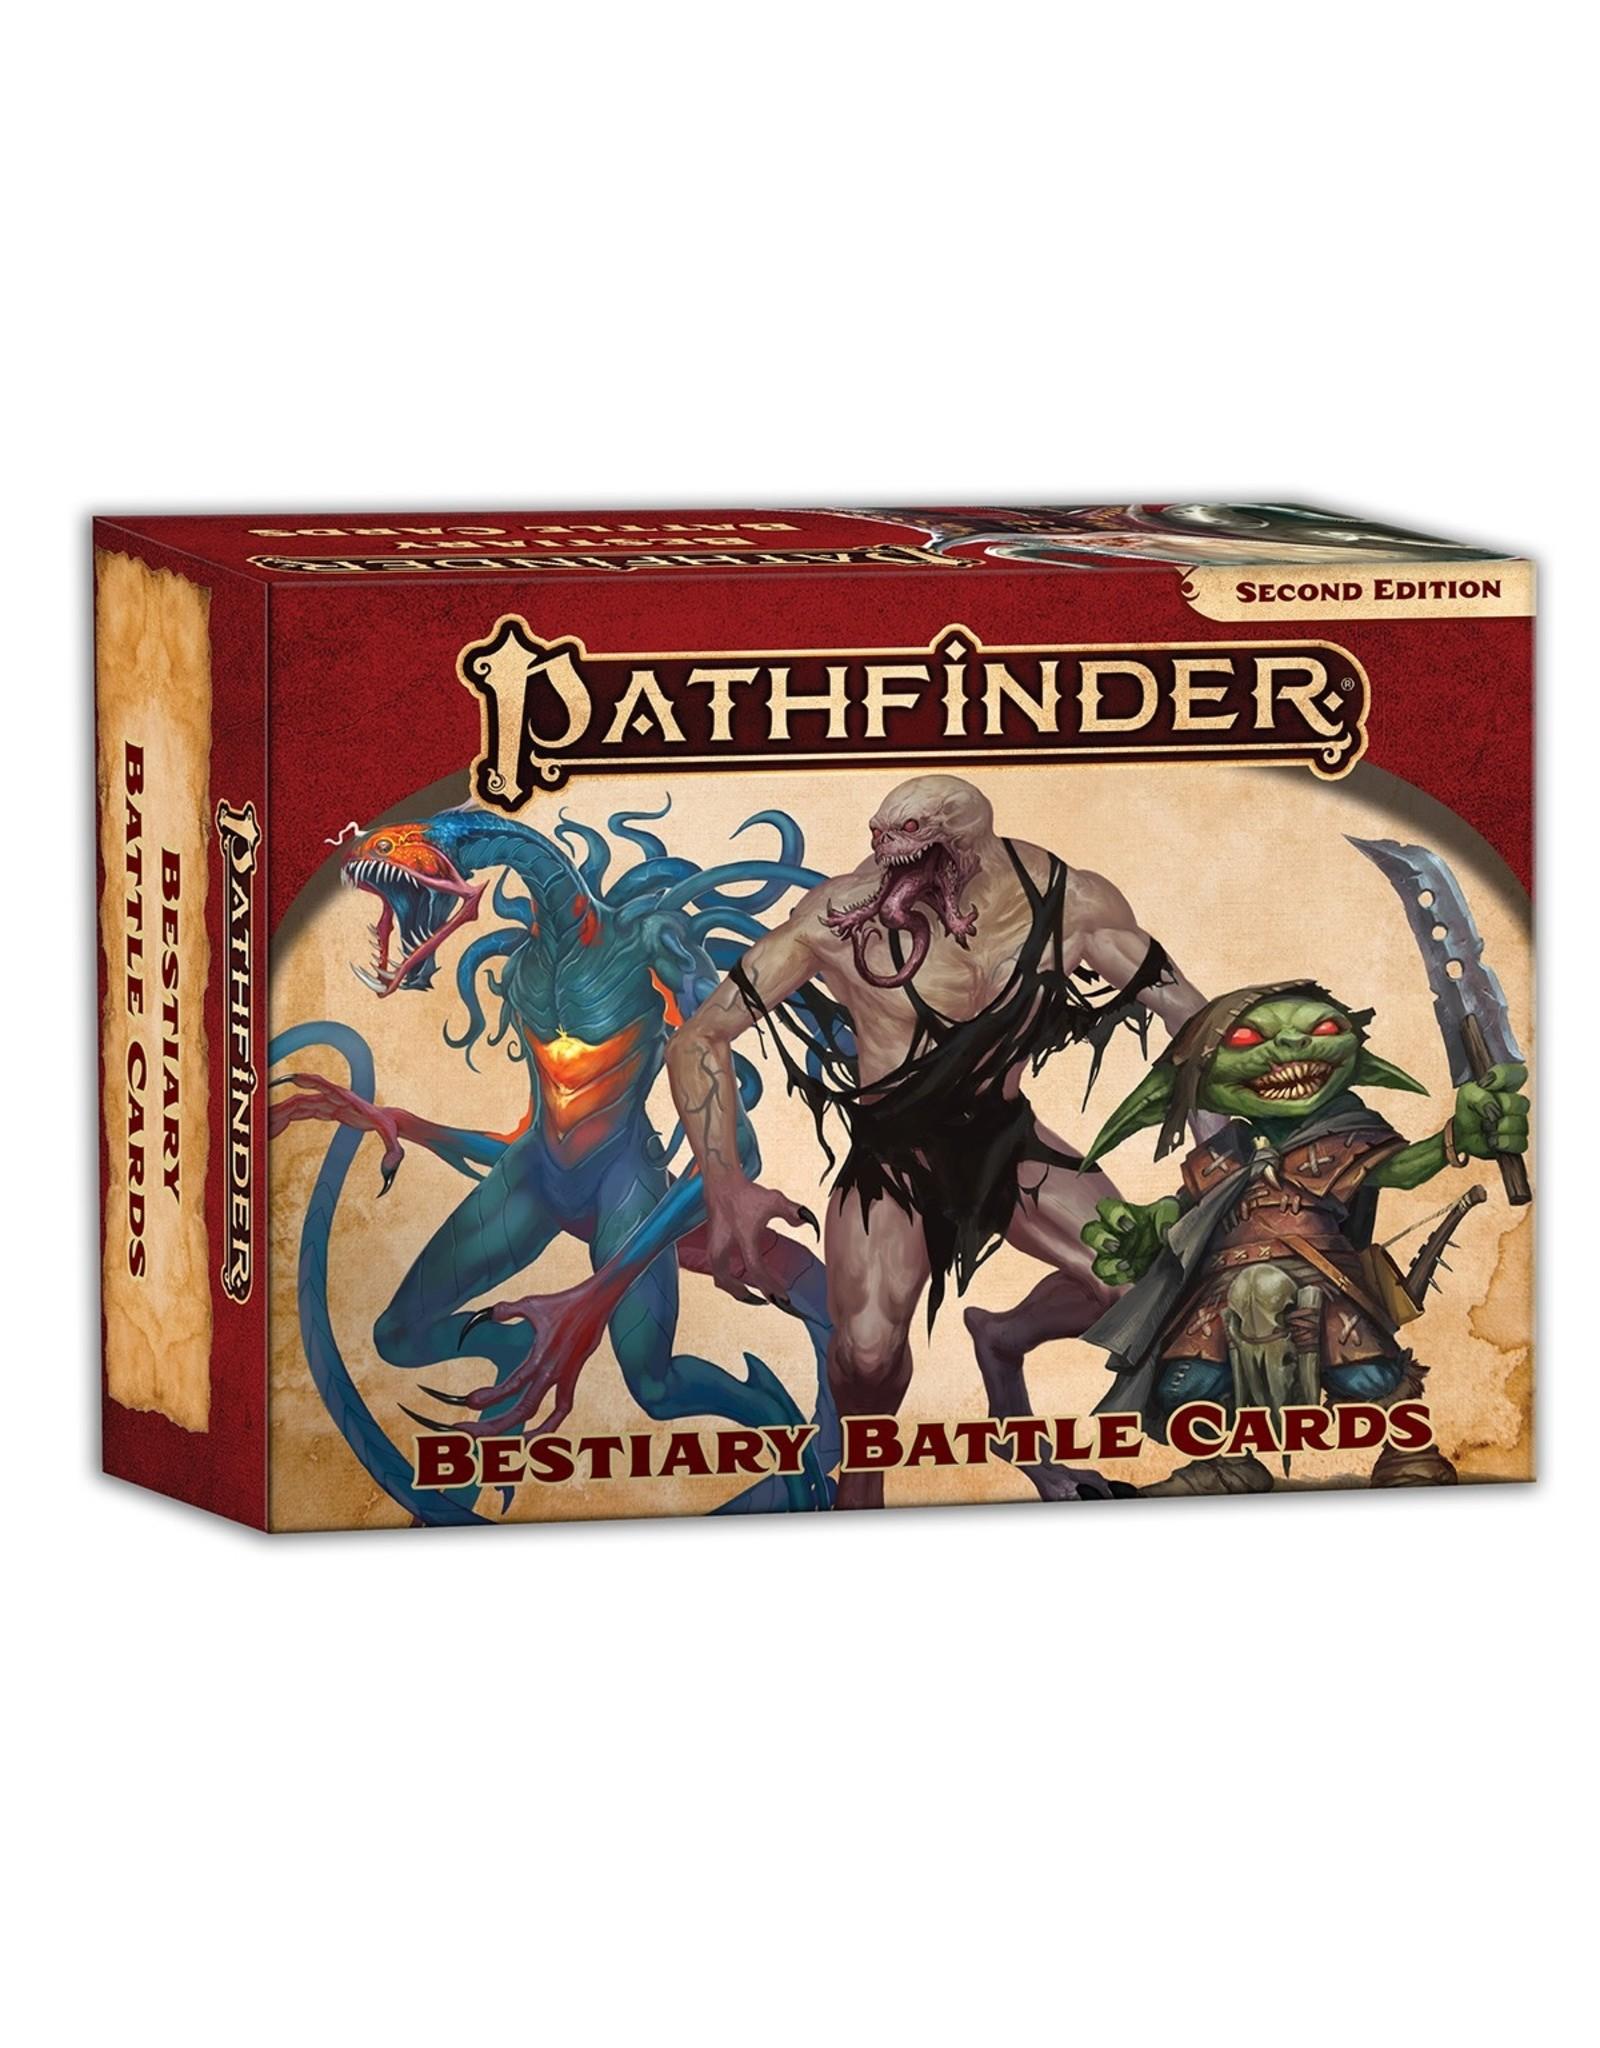 Paizo Pathfinder 2E - Bestiary Battle Cards